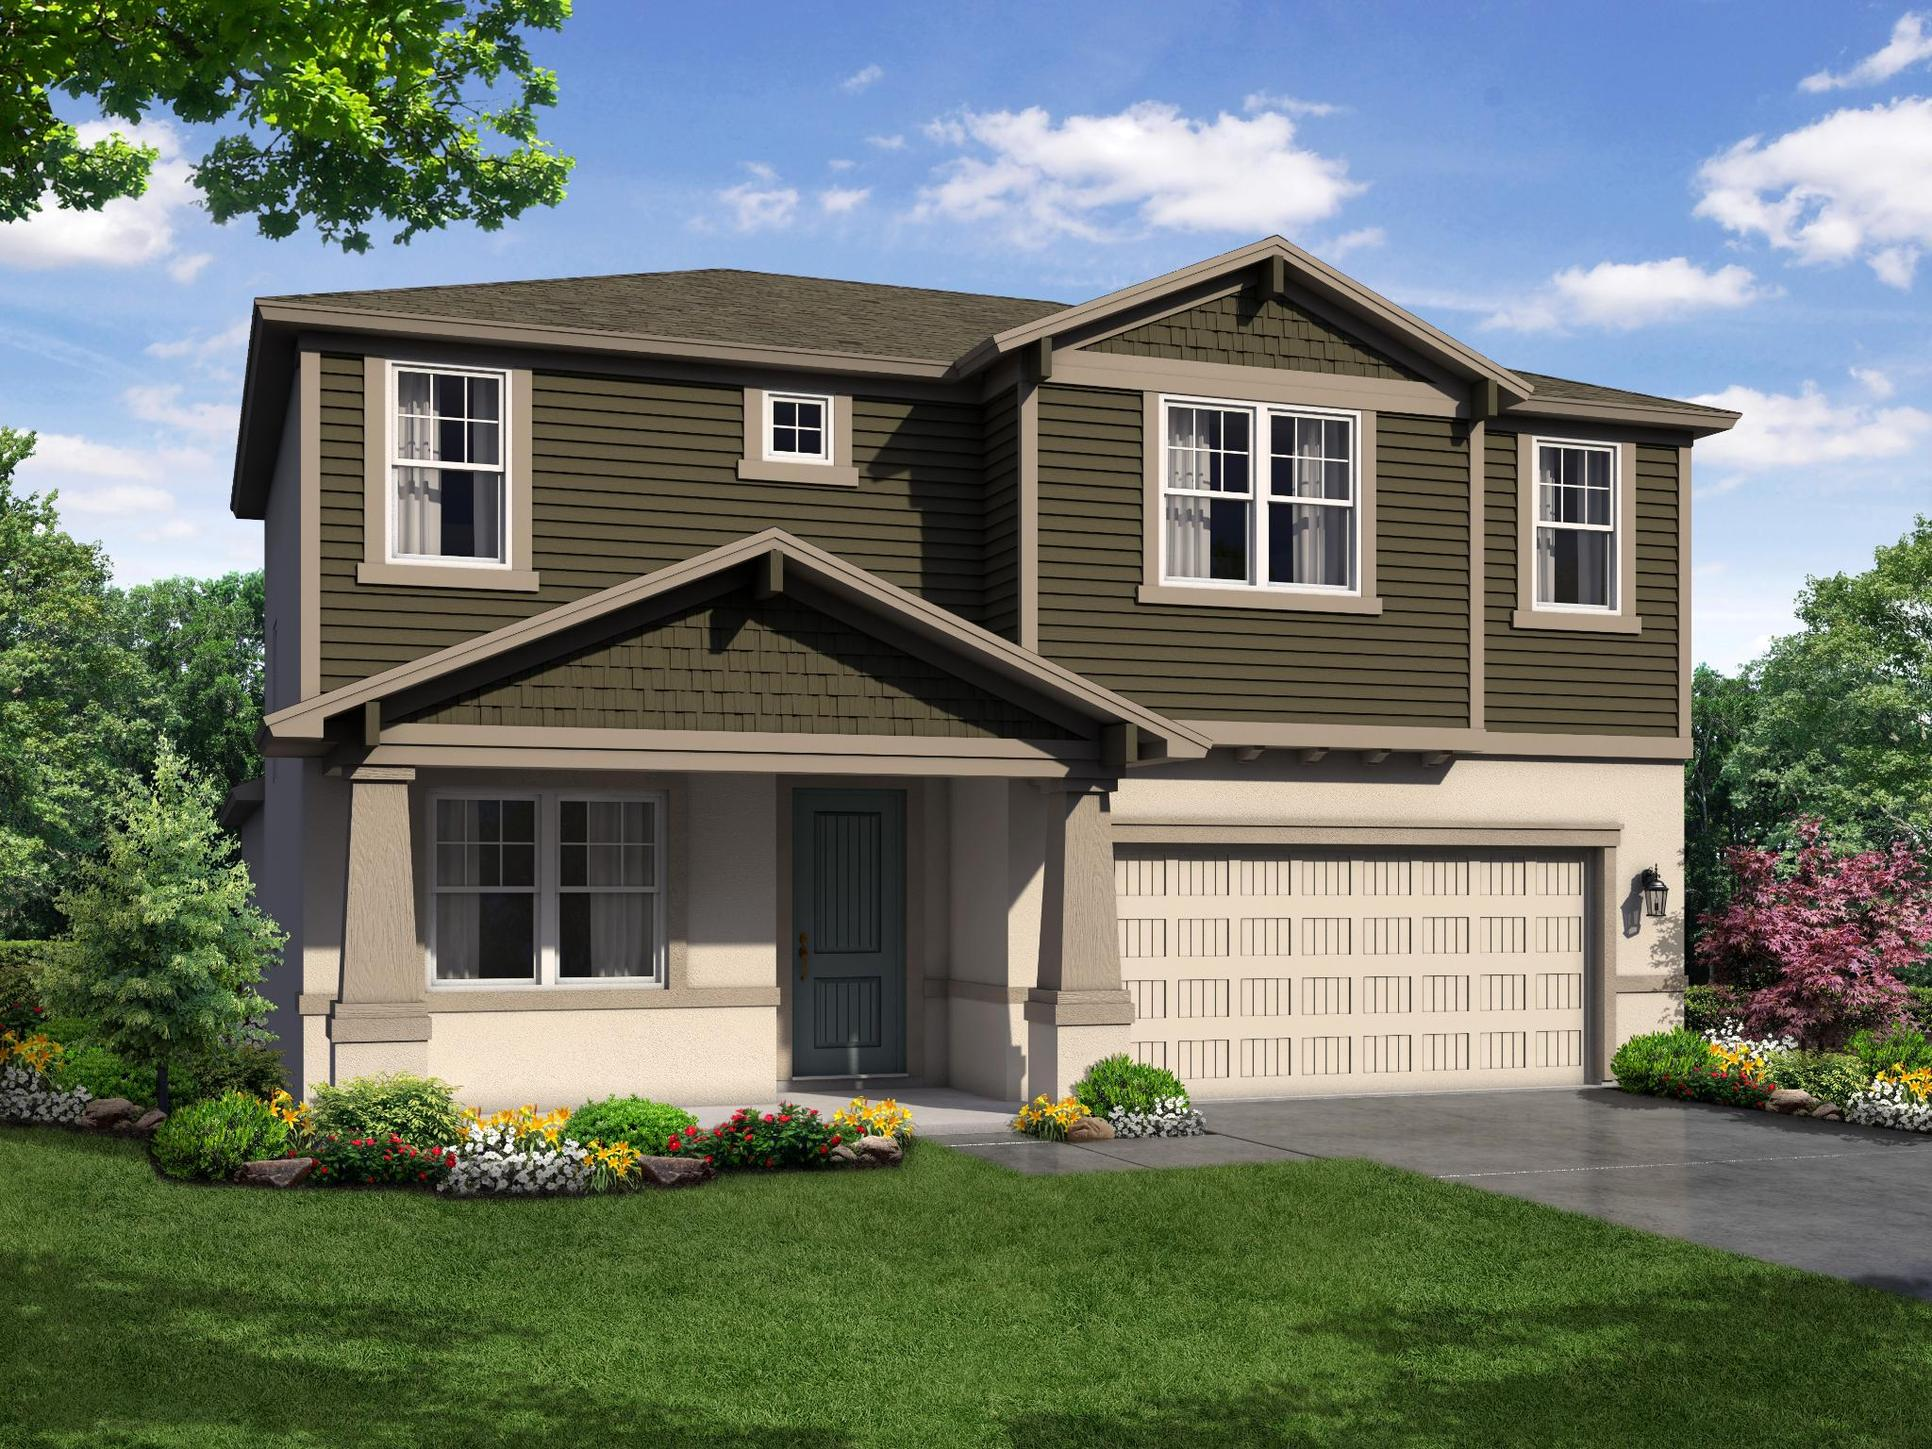 Sandalwood Craftsman elevation William Ryan Homes Tampa:Sandalwood - Craftsman Elevation